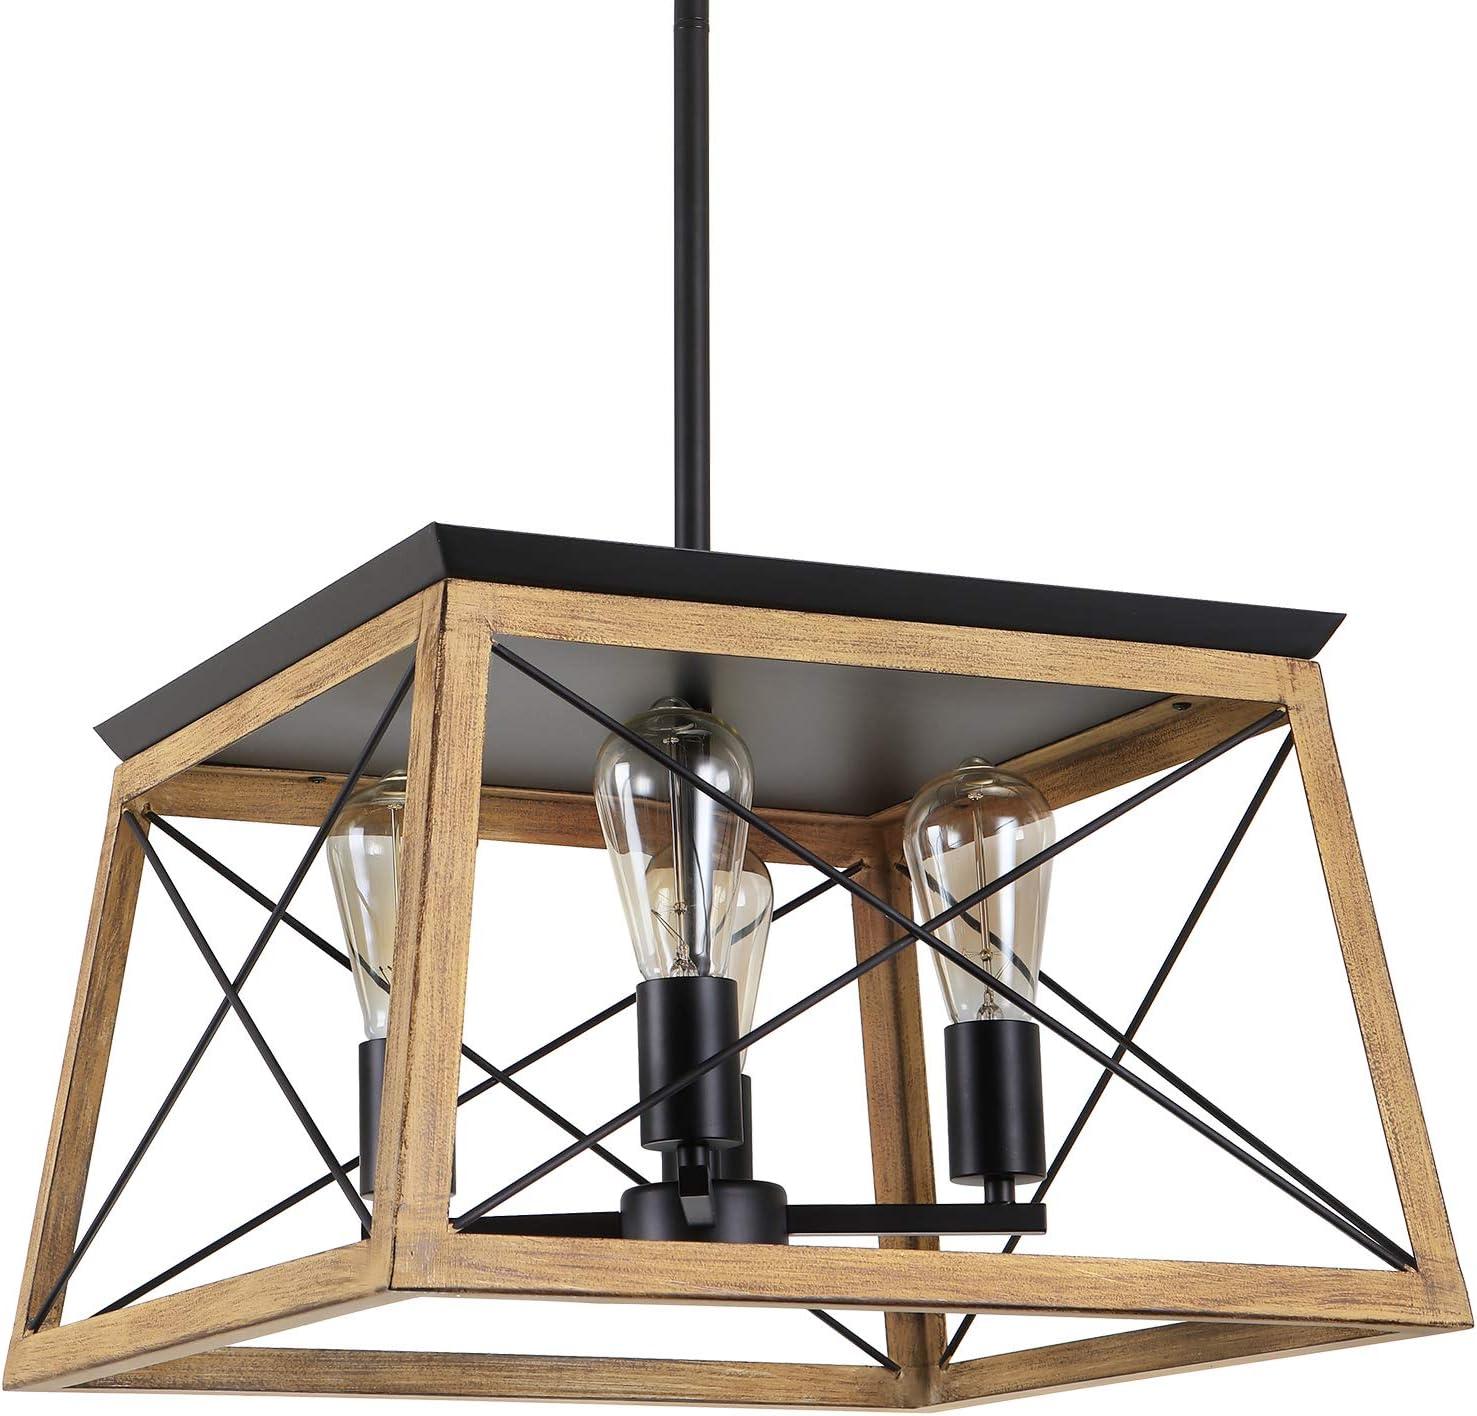 Luupyia Farmhouse Pendant Light Adjustable 4-Lights Limited time cheap sale Inexpensive R Fixture